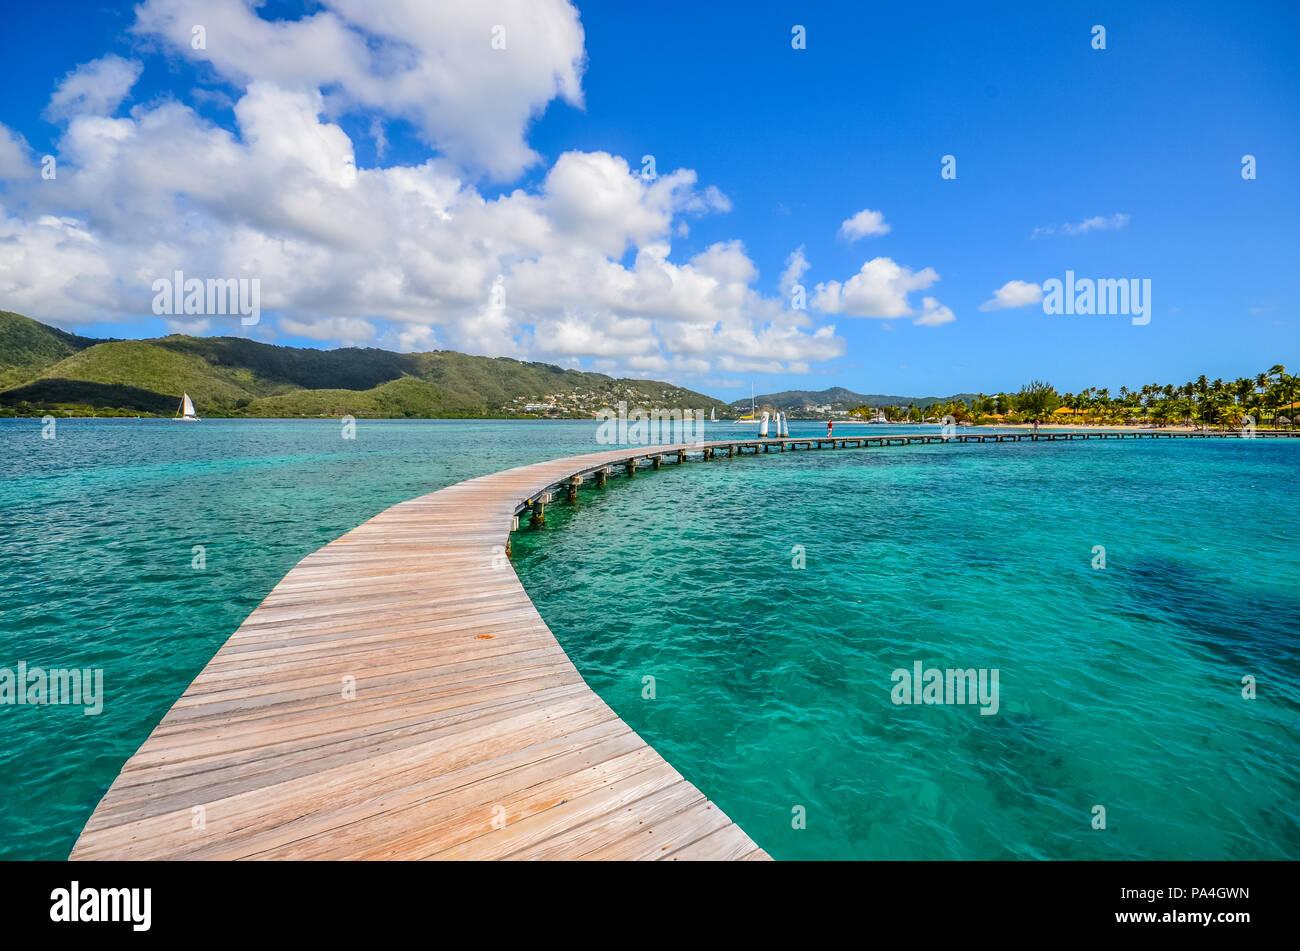 Caribbean Martinique pontoon on marin bay - Stock Image